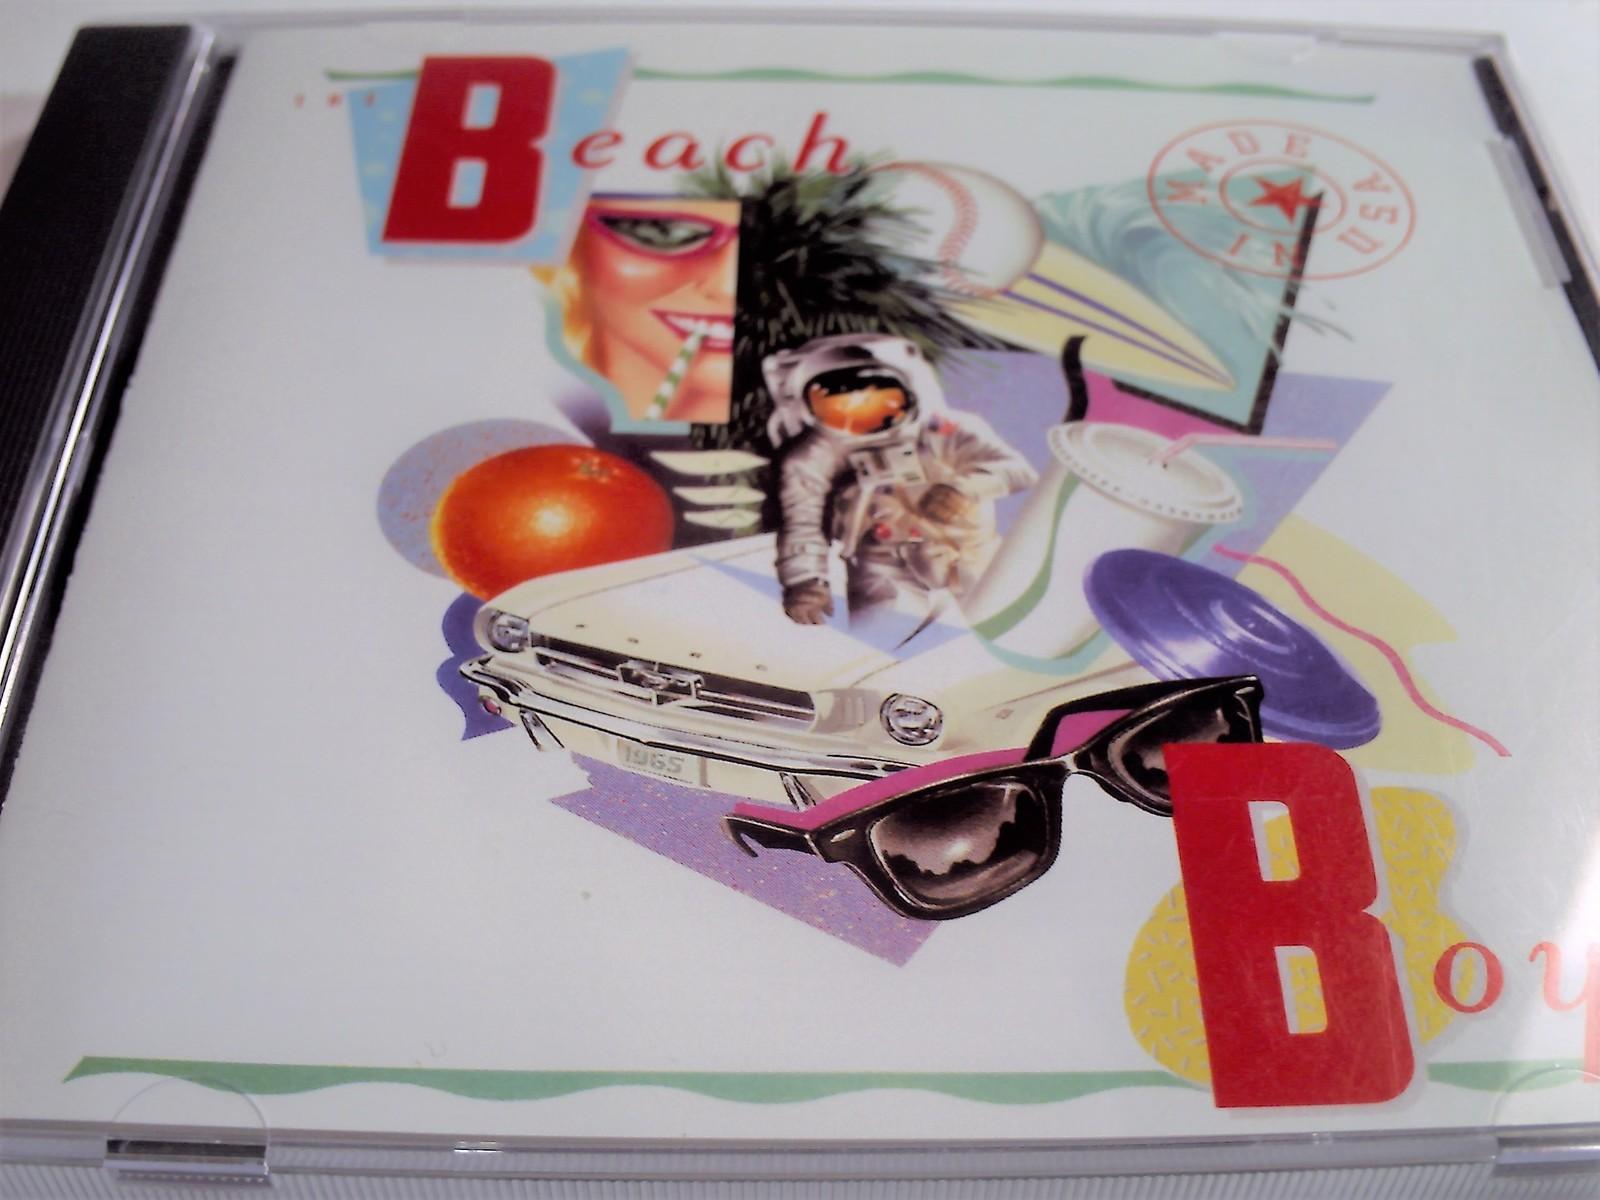 The Beach Boys Made In U.S.A. CD